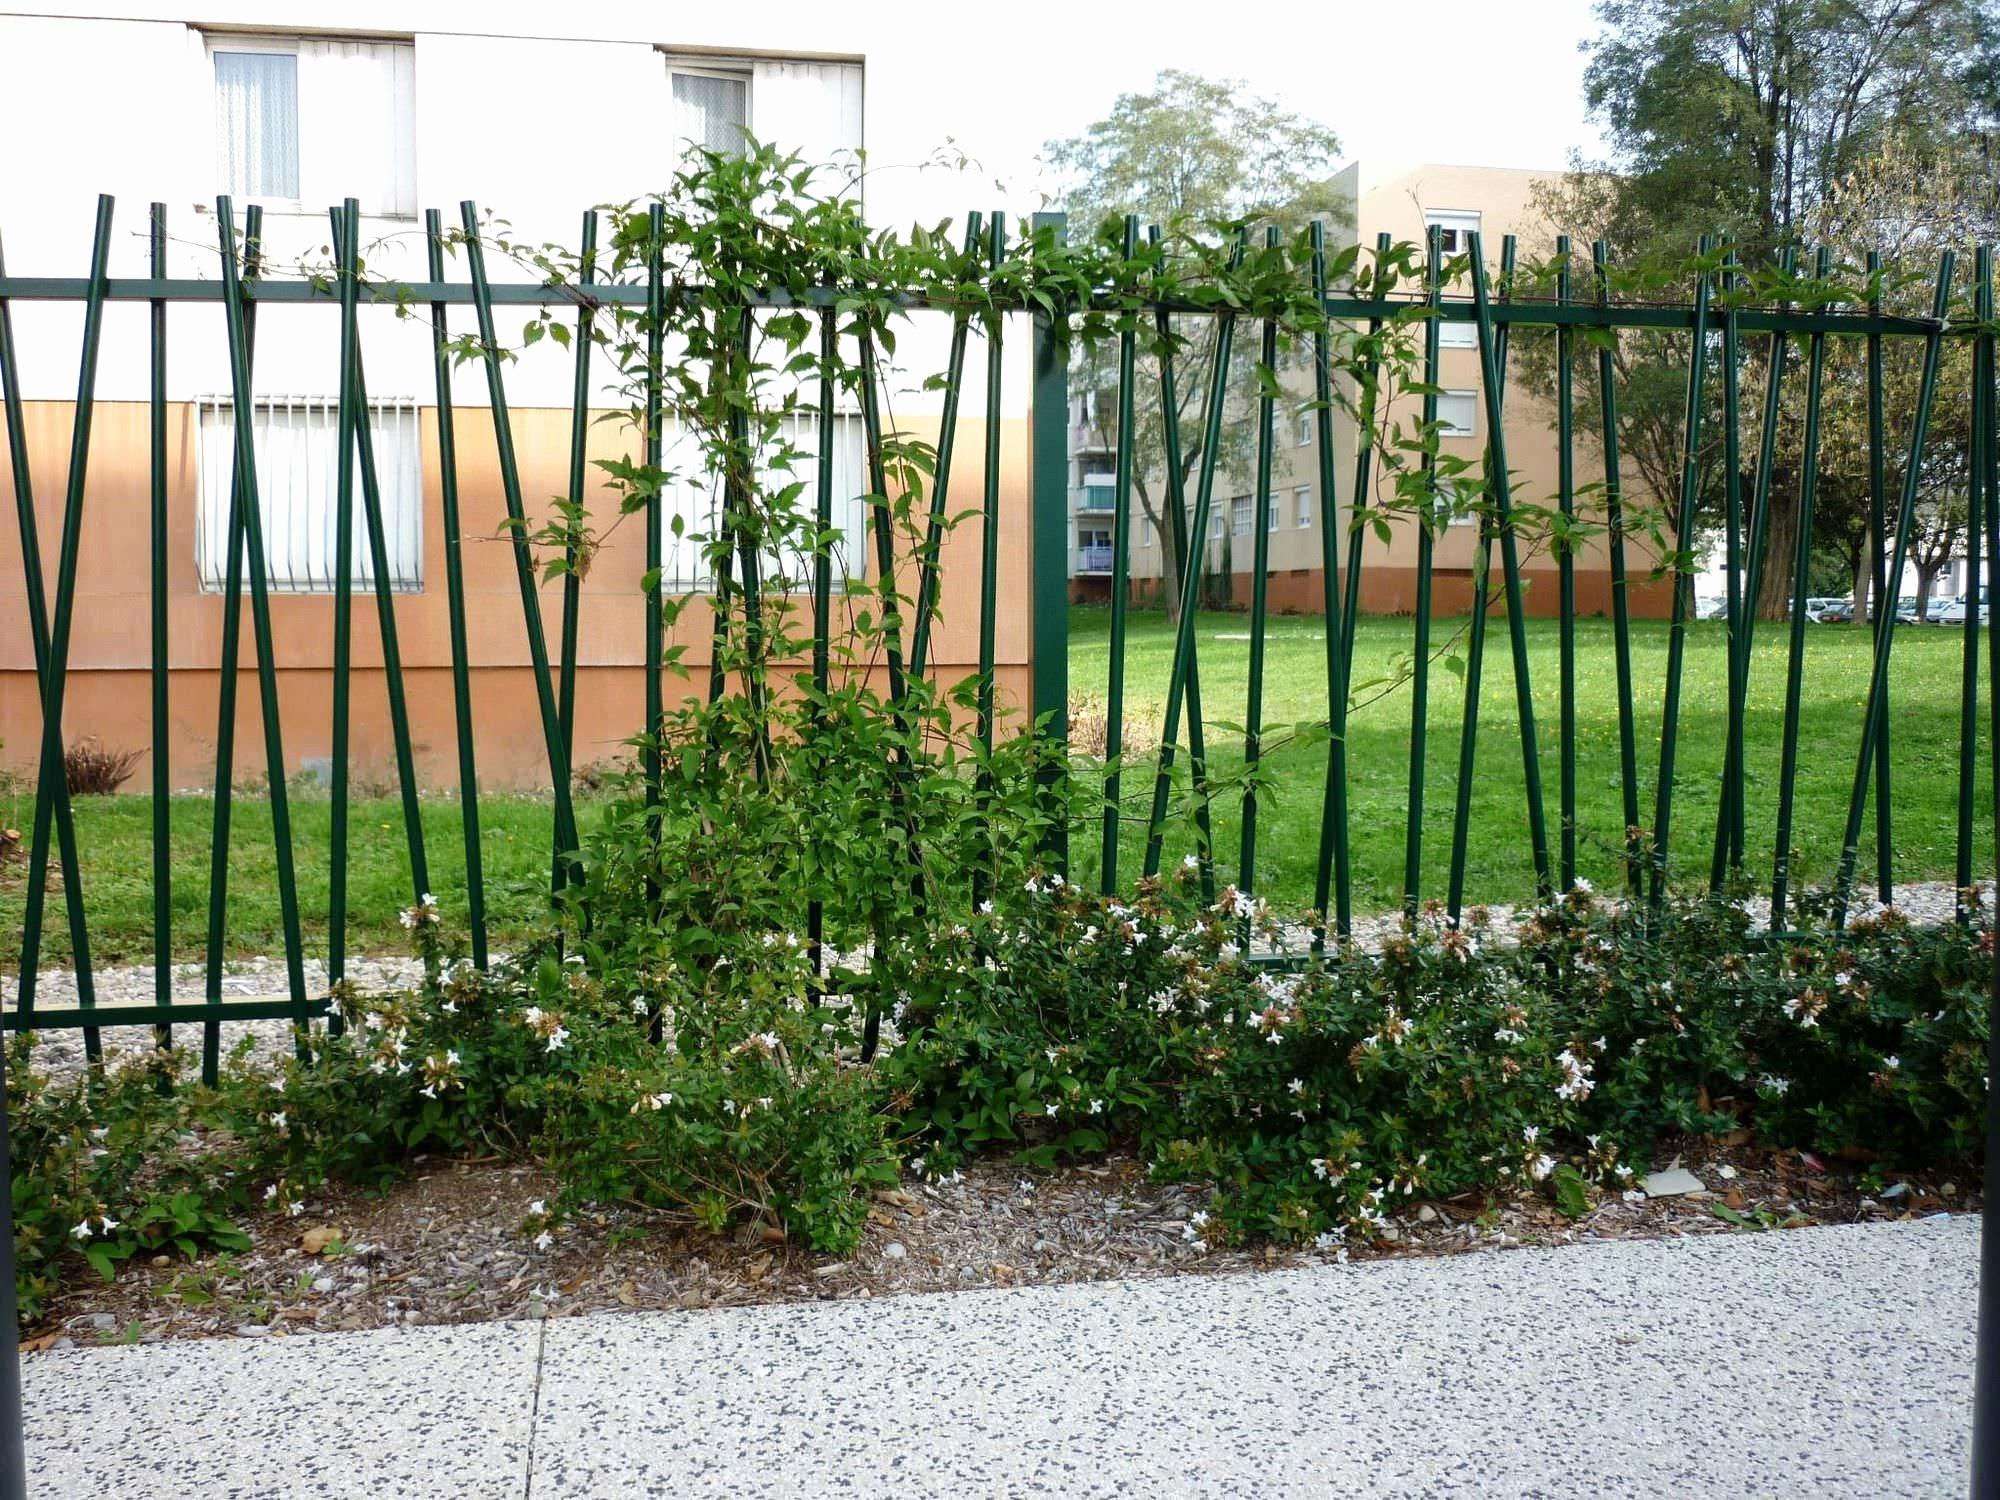 Carrefour Abri De Jardin Inspirant Images Carrefour Abris De Jardin Pour Magnifique Cabane De Jardin originale